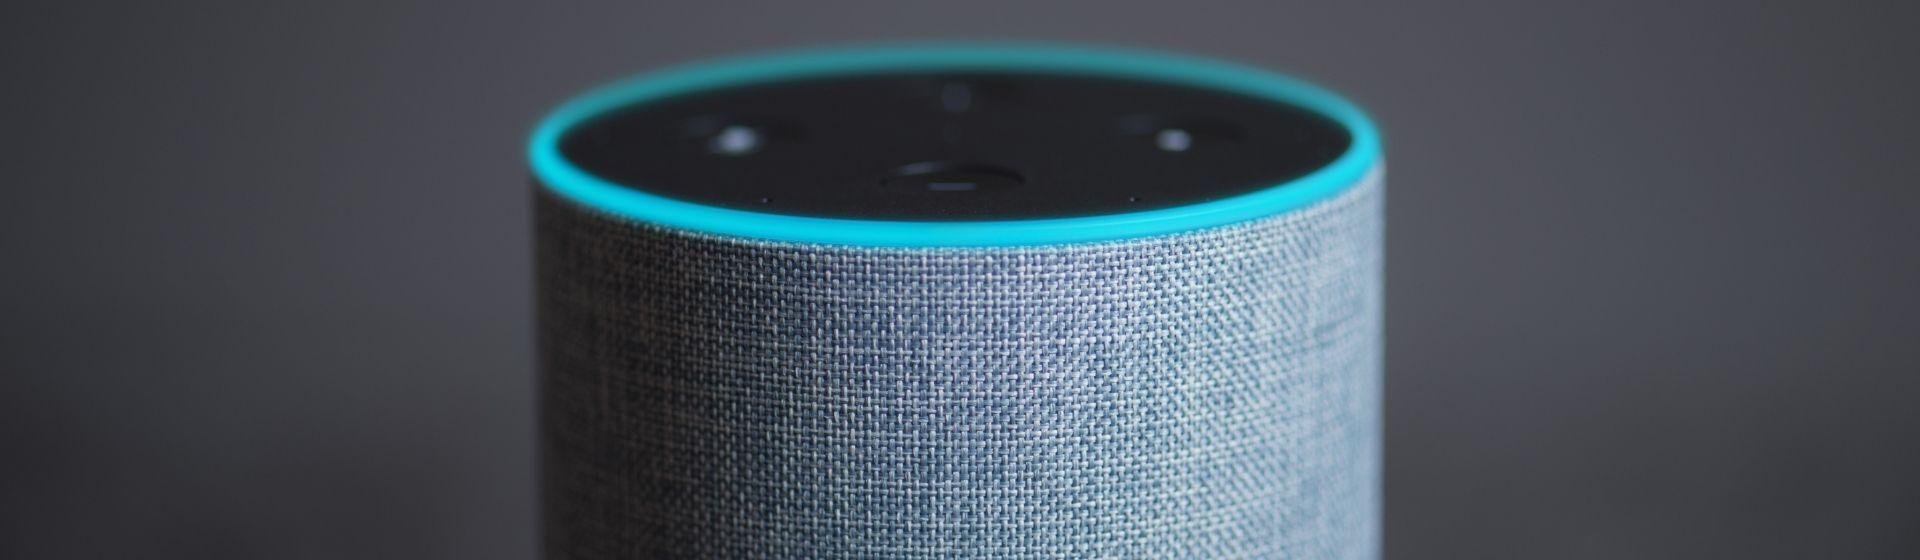 Presentes Smart no Natal 2020: confira 5 produtos para deixar a casa inteligente